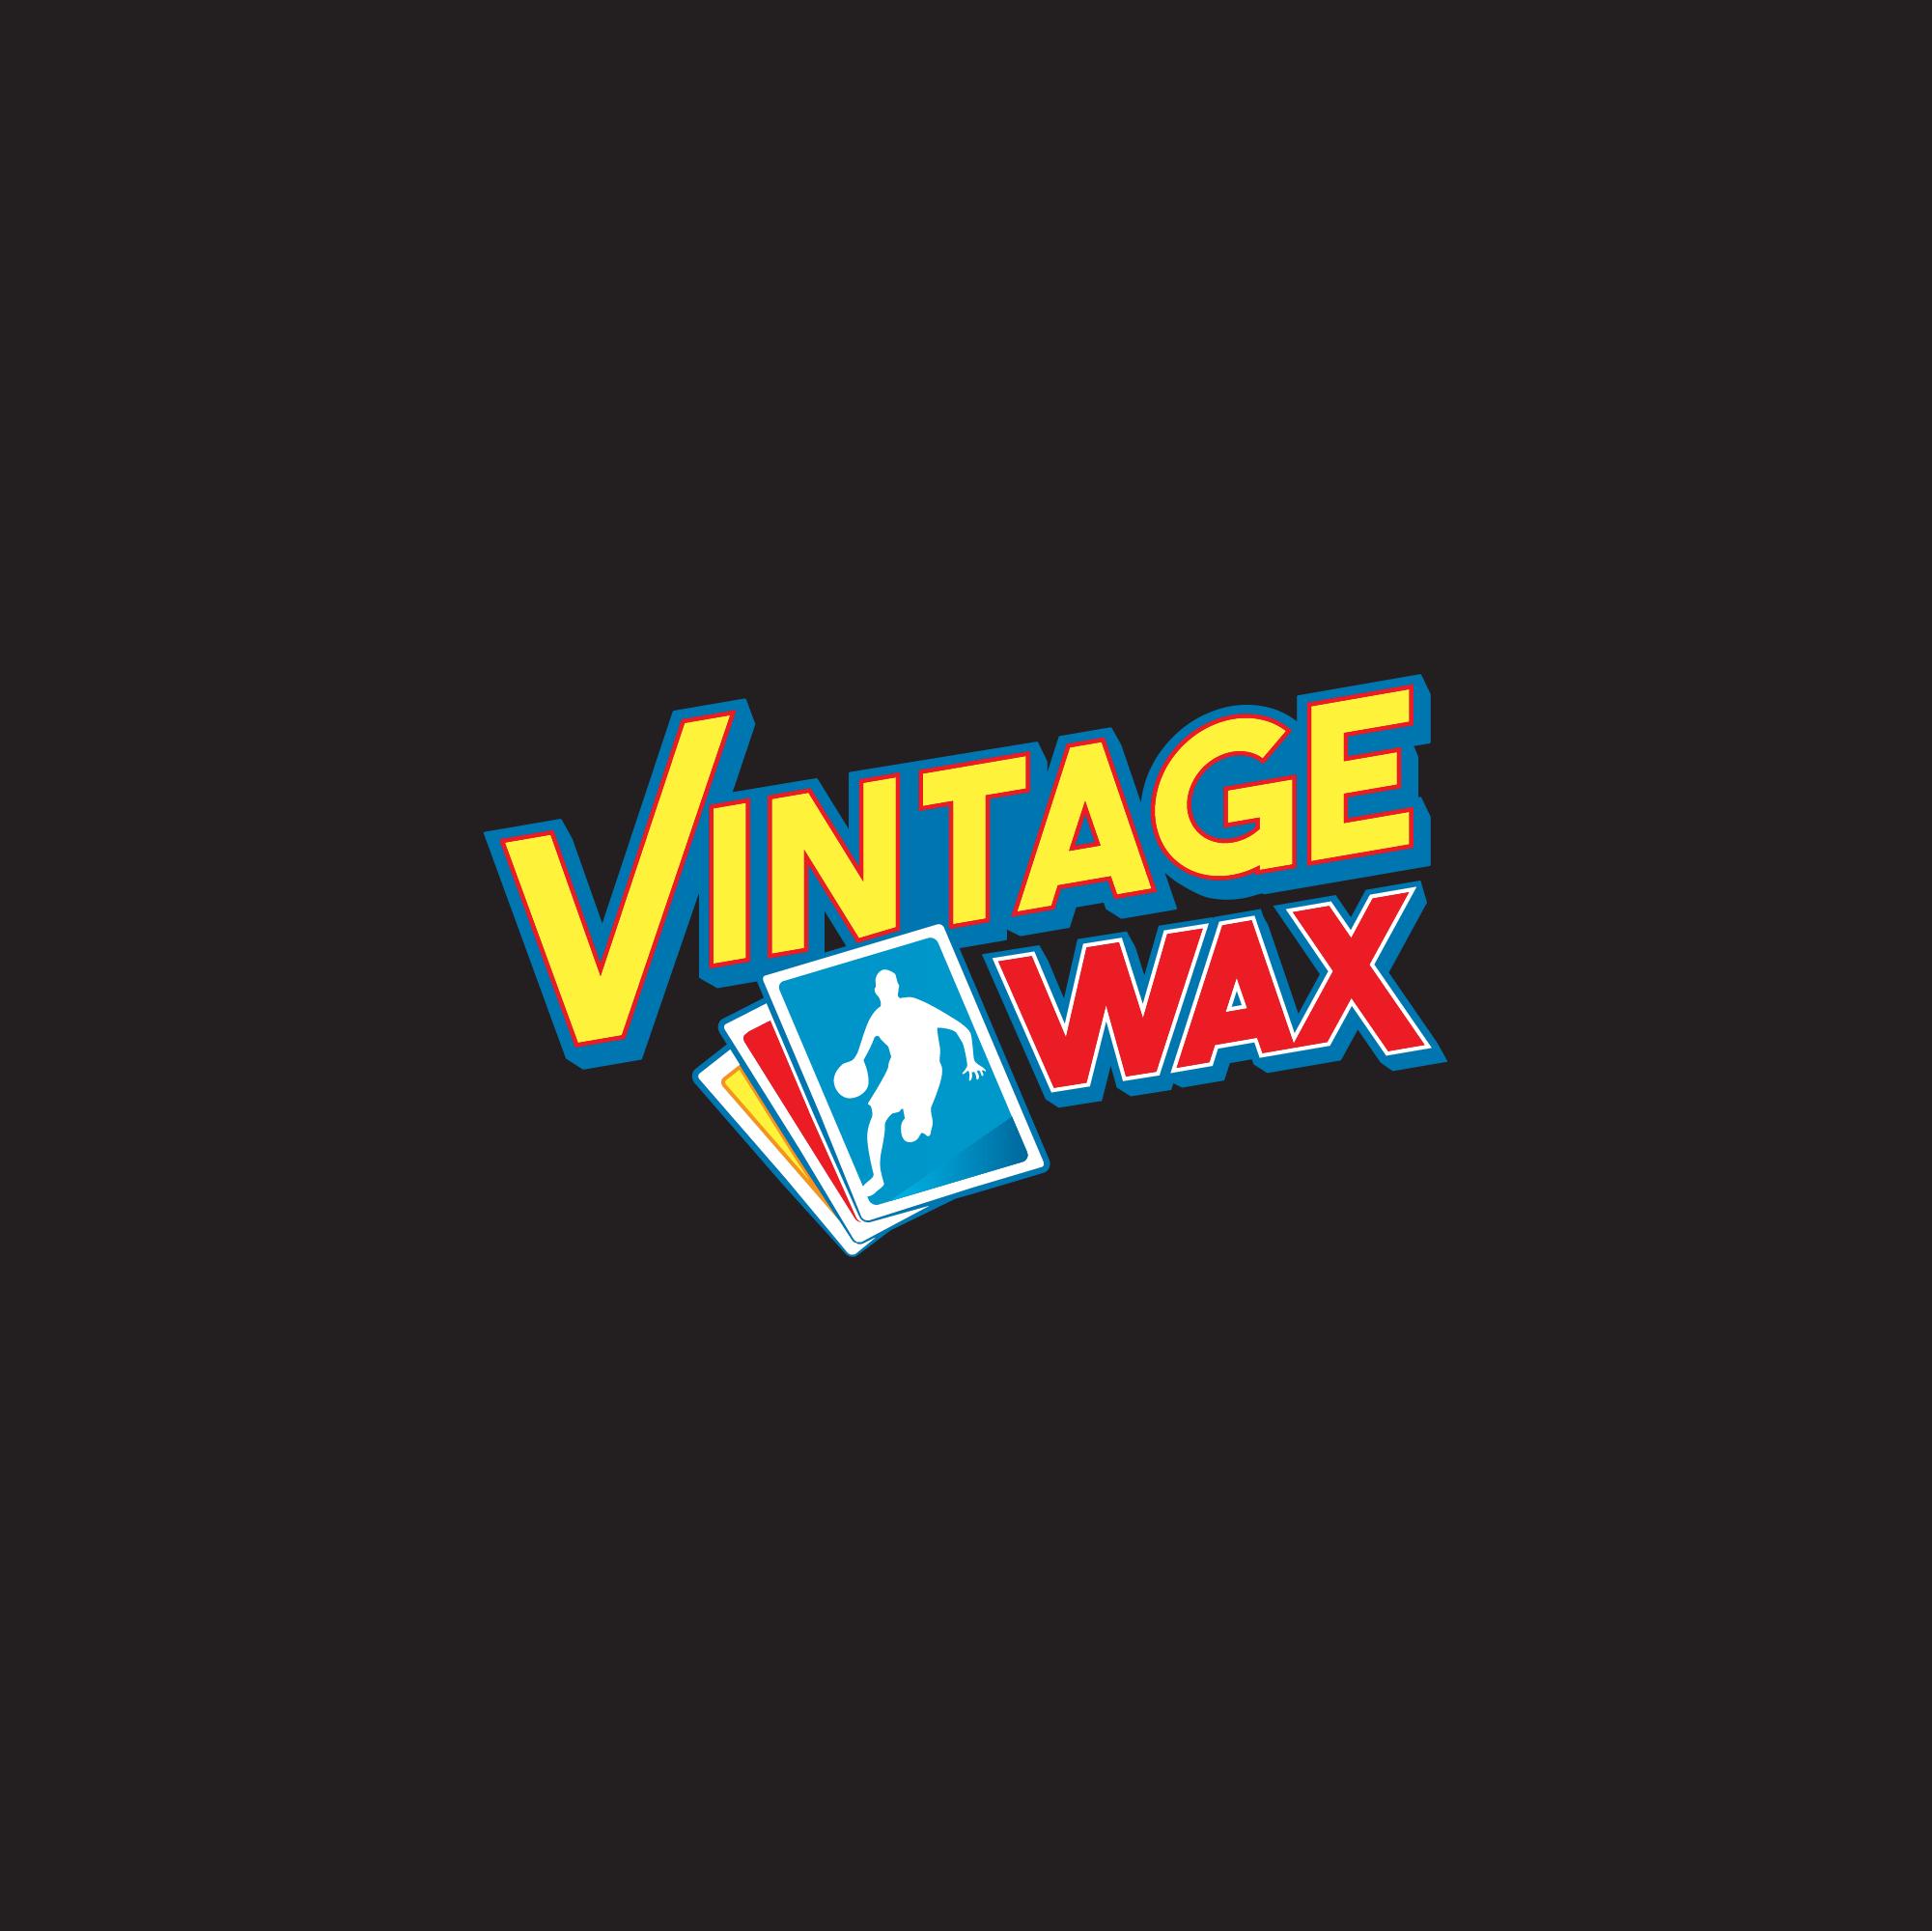 Vintage Wax needs a Vintage Logo